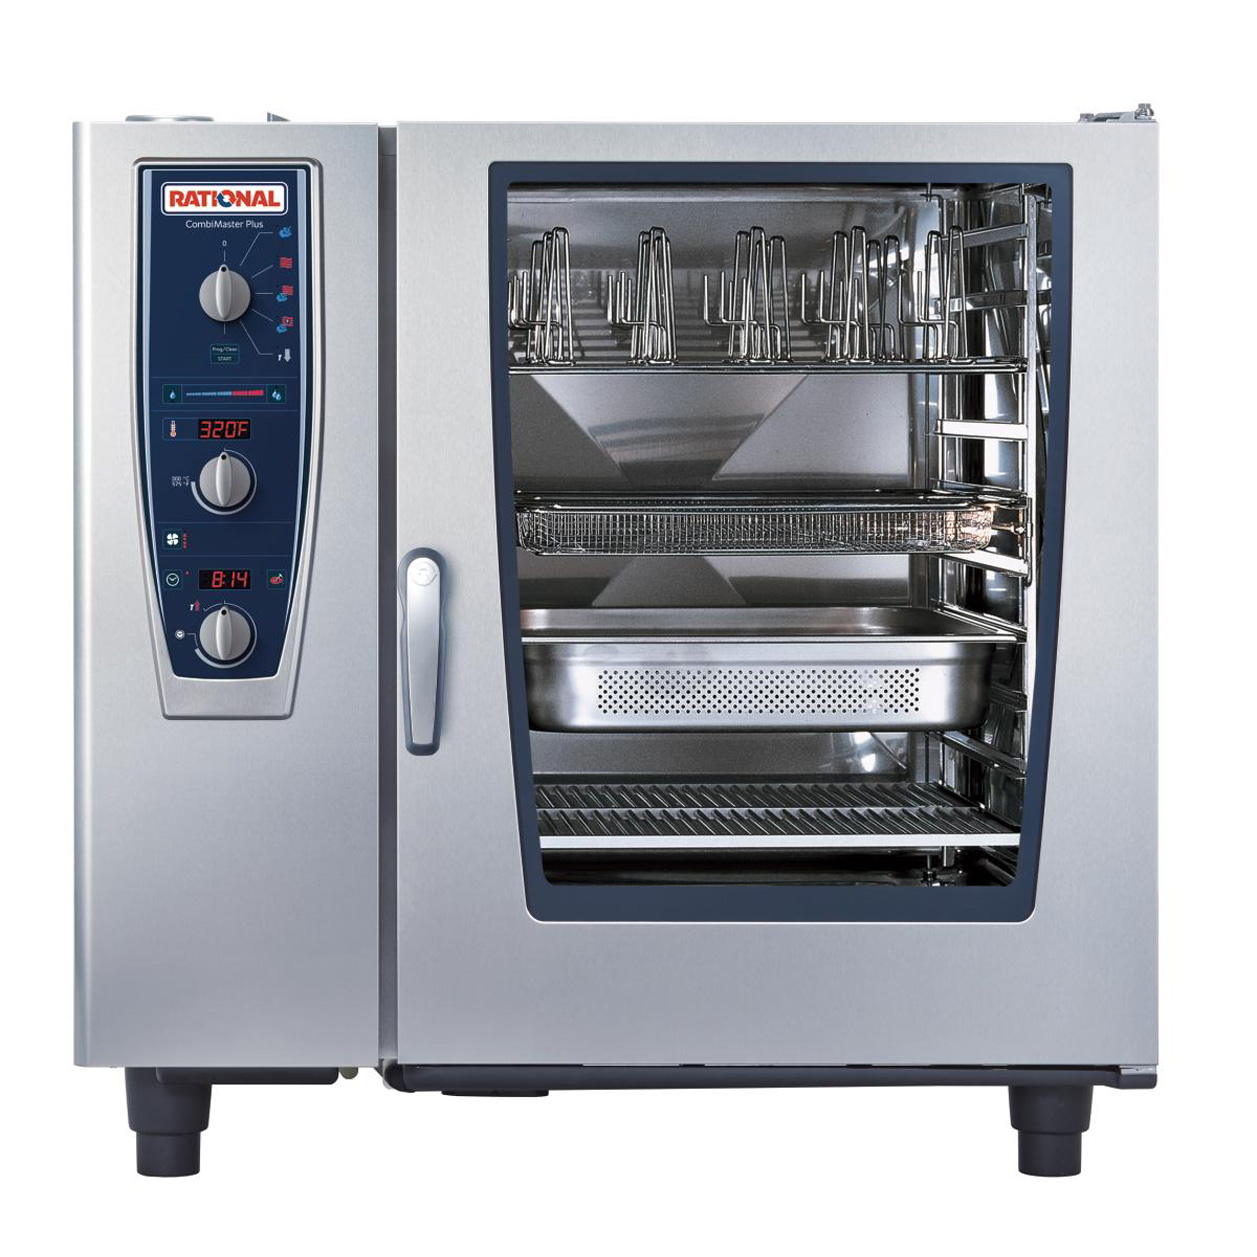 RATIONAL B129206.19E202 combi oven, gas